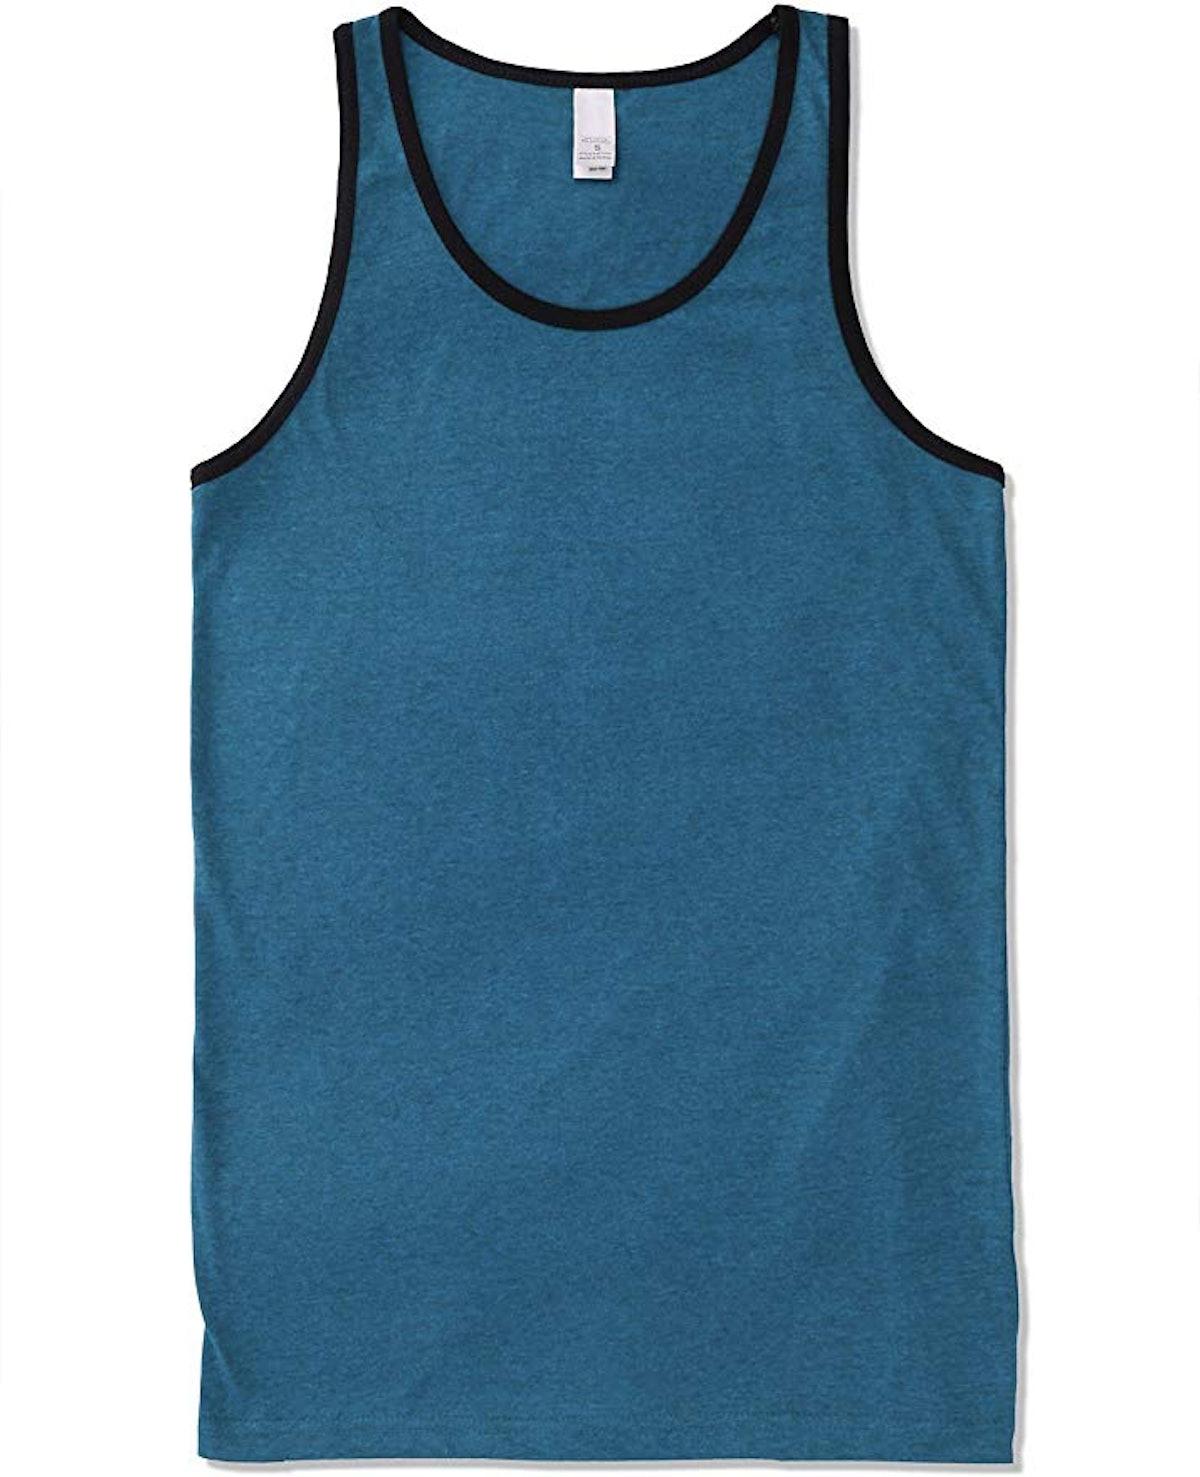 Men's Premium Basic Tank Top Jersey Casual Shirts (Size Upto 3XL